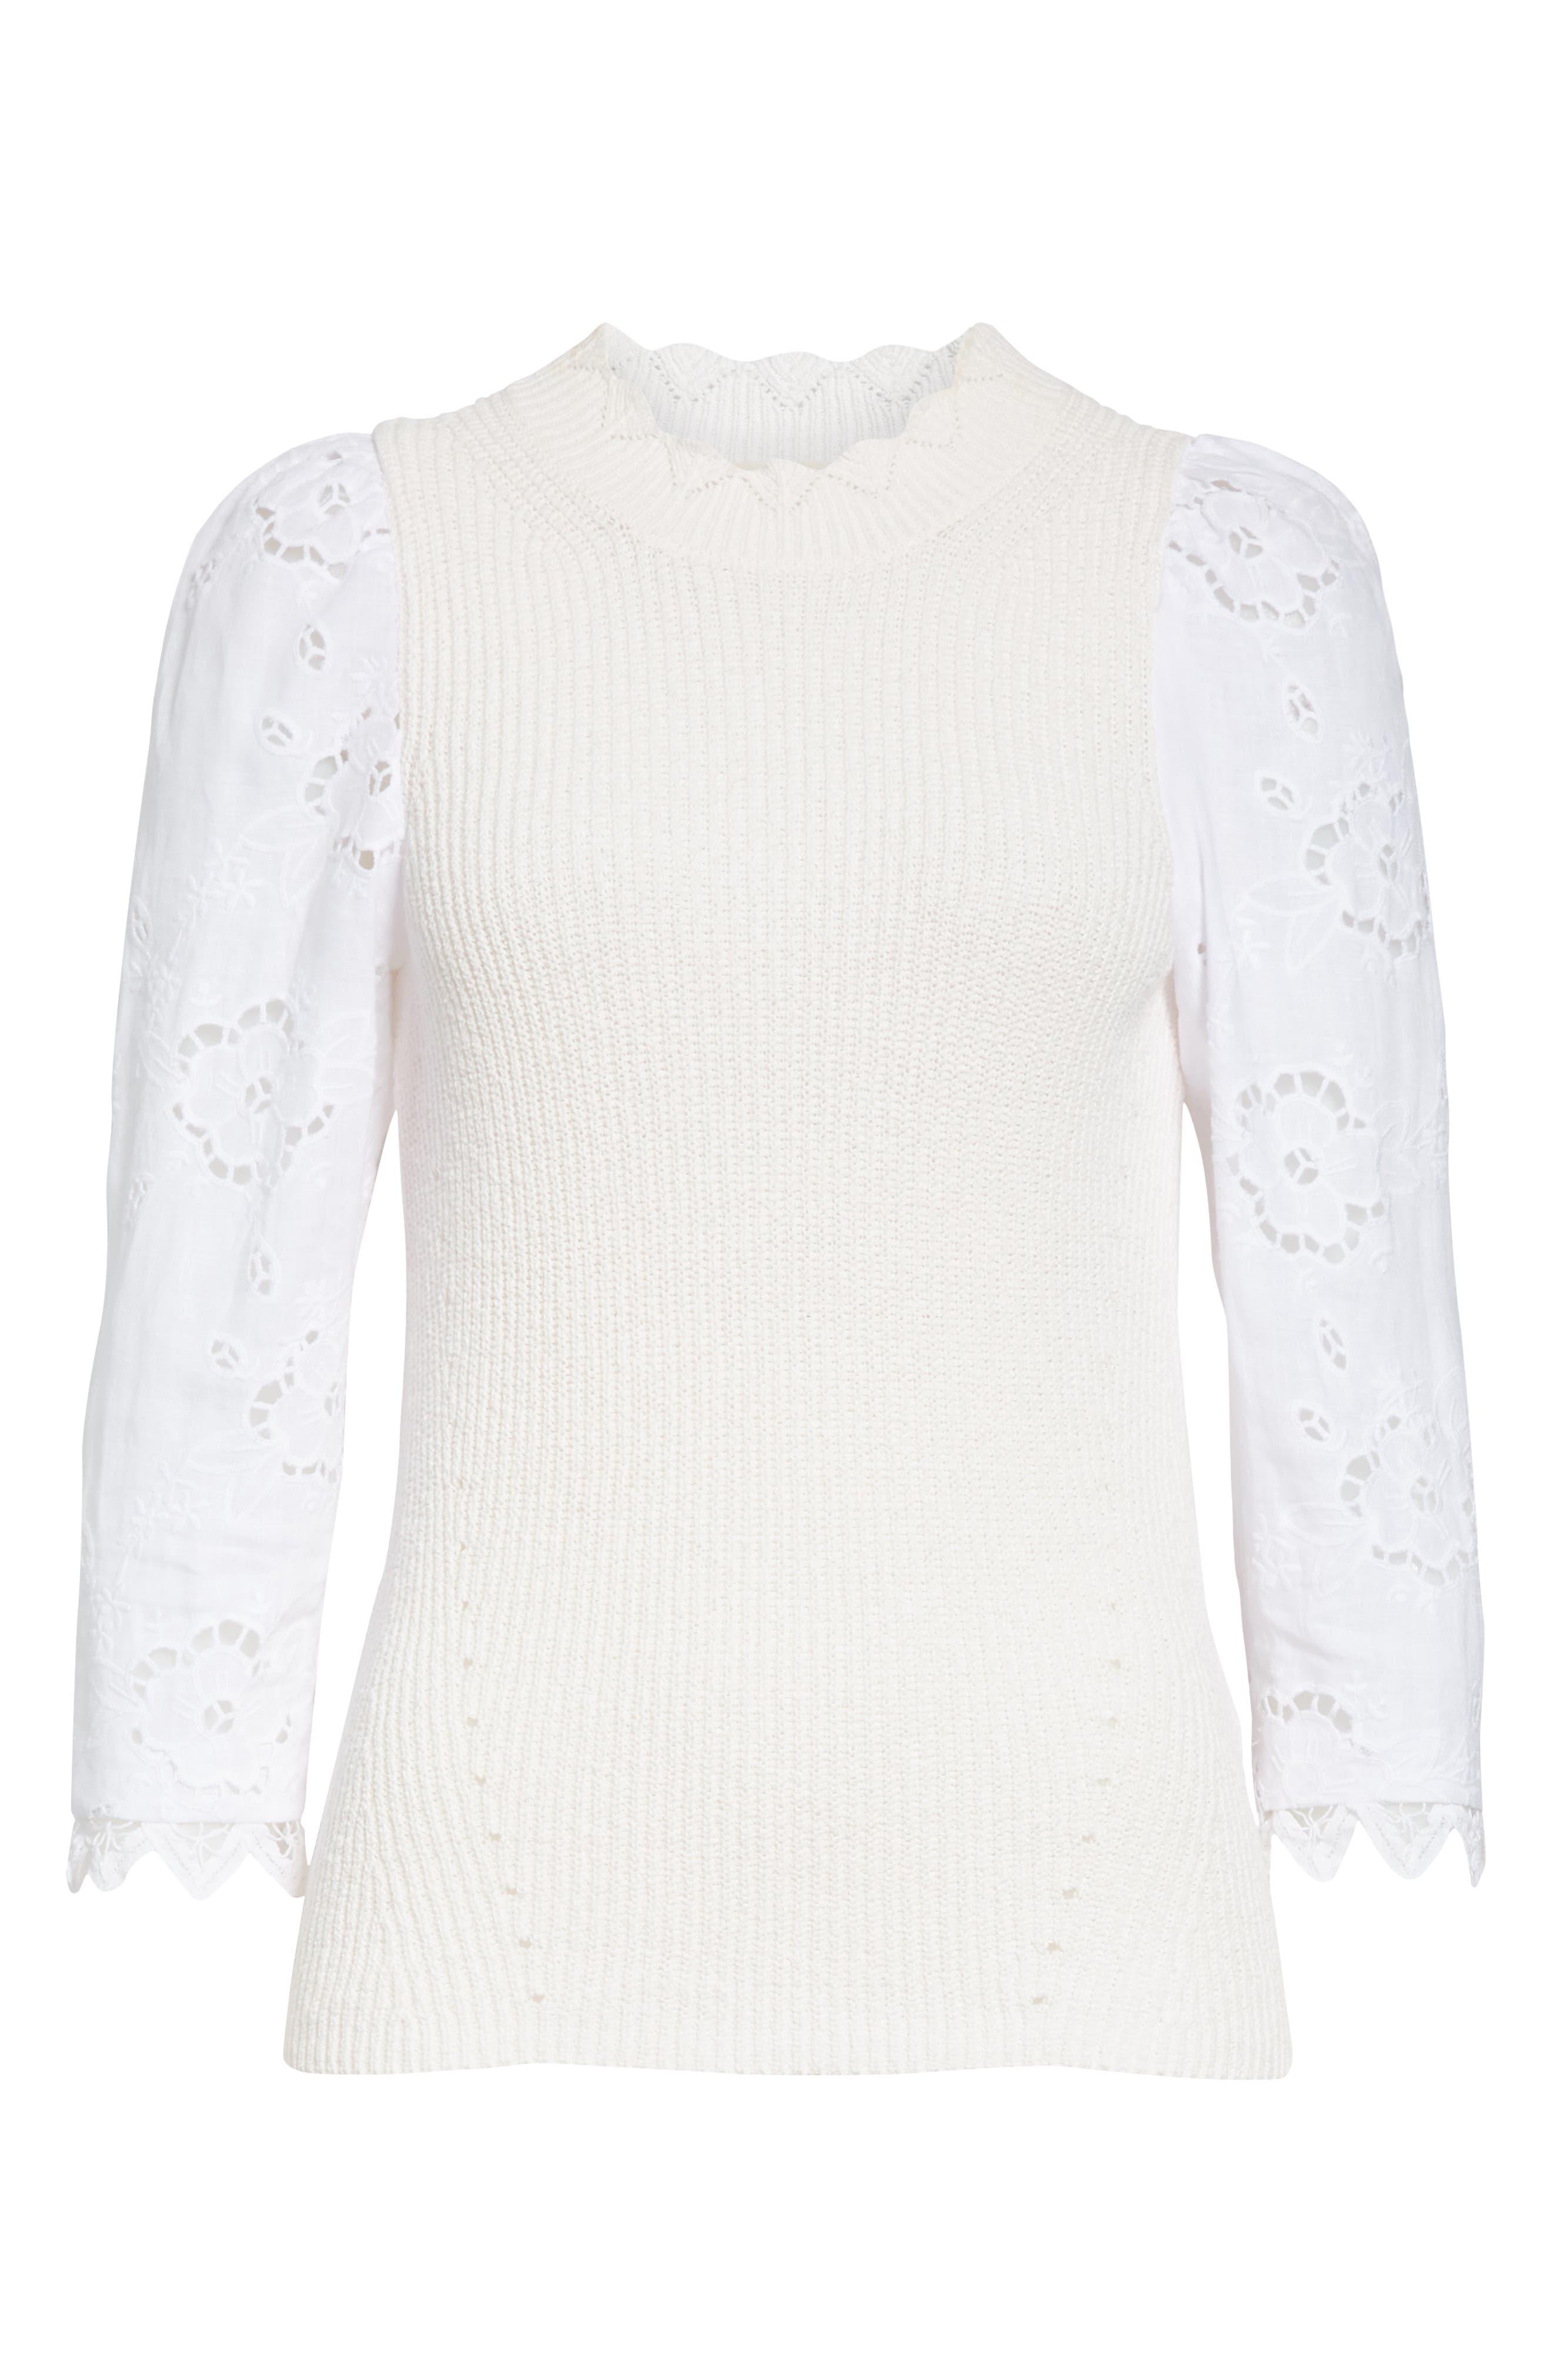 REBECCA TAYLOR, Mix Media Eyelet Sleeve Cotton Sweater, Alternate thumbnail 6, color, WASHED PETAL